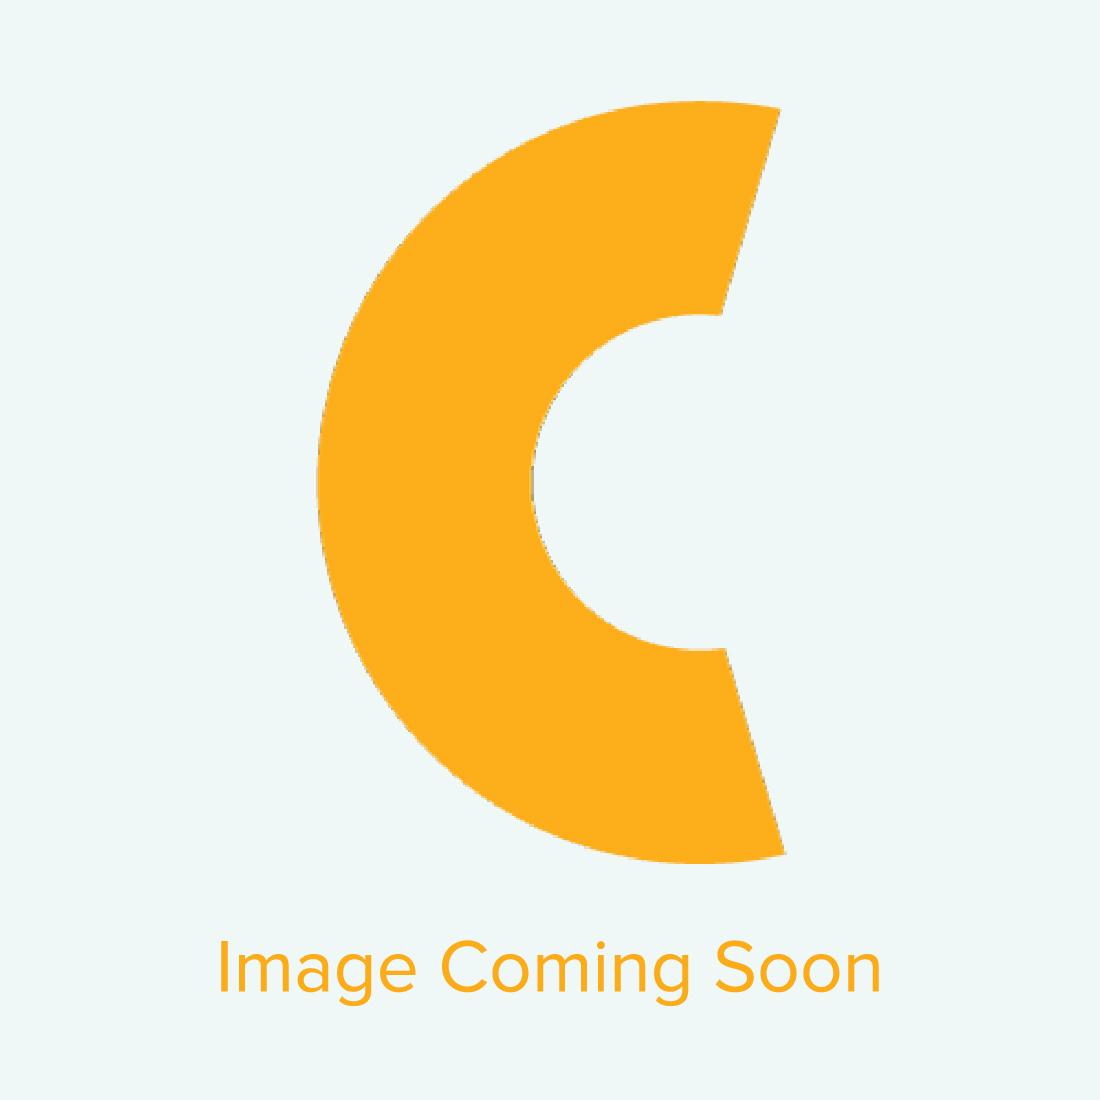 ChromaLuxe Sublimation Cuff Bracelet - Crete Design